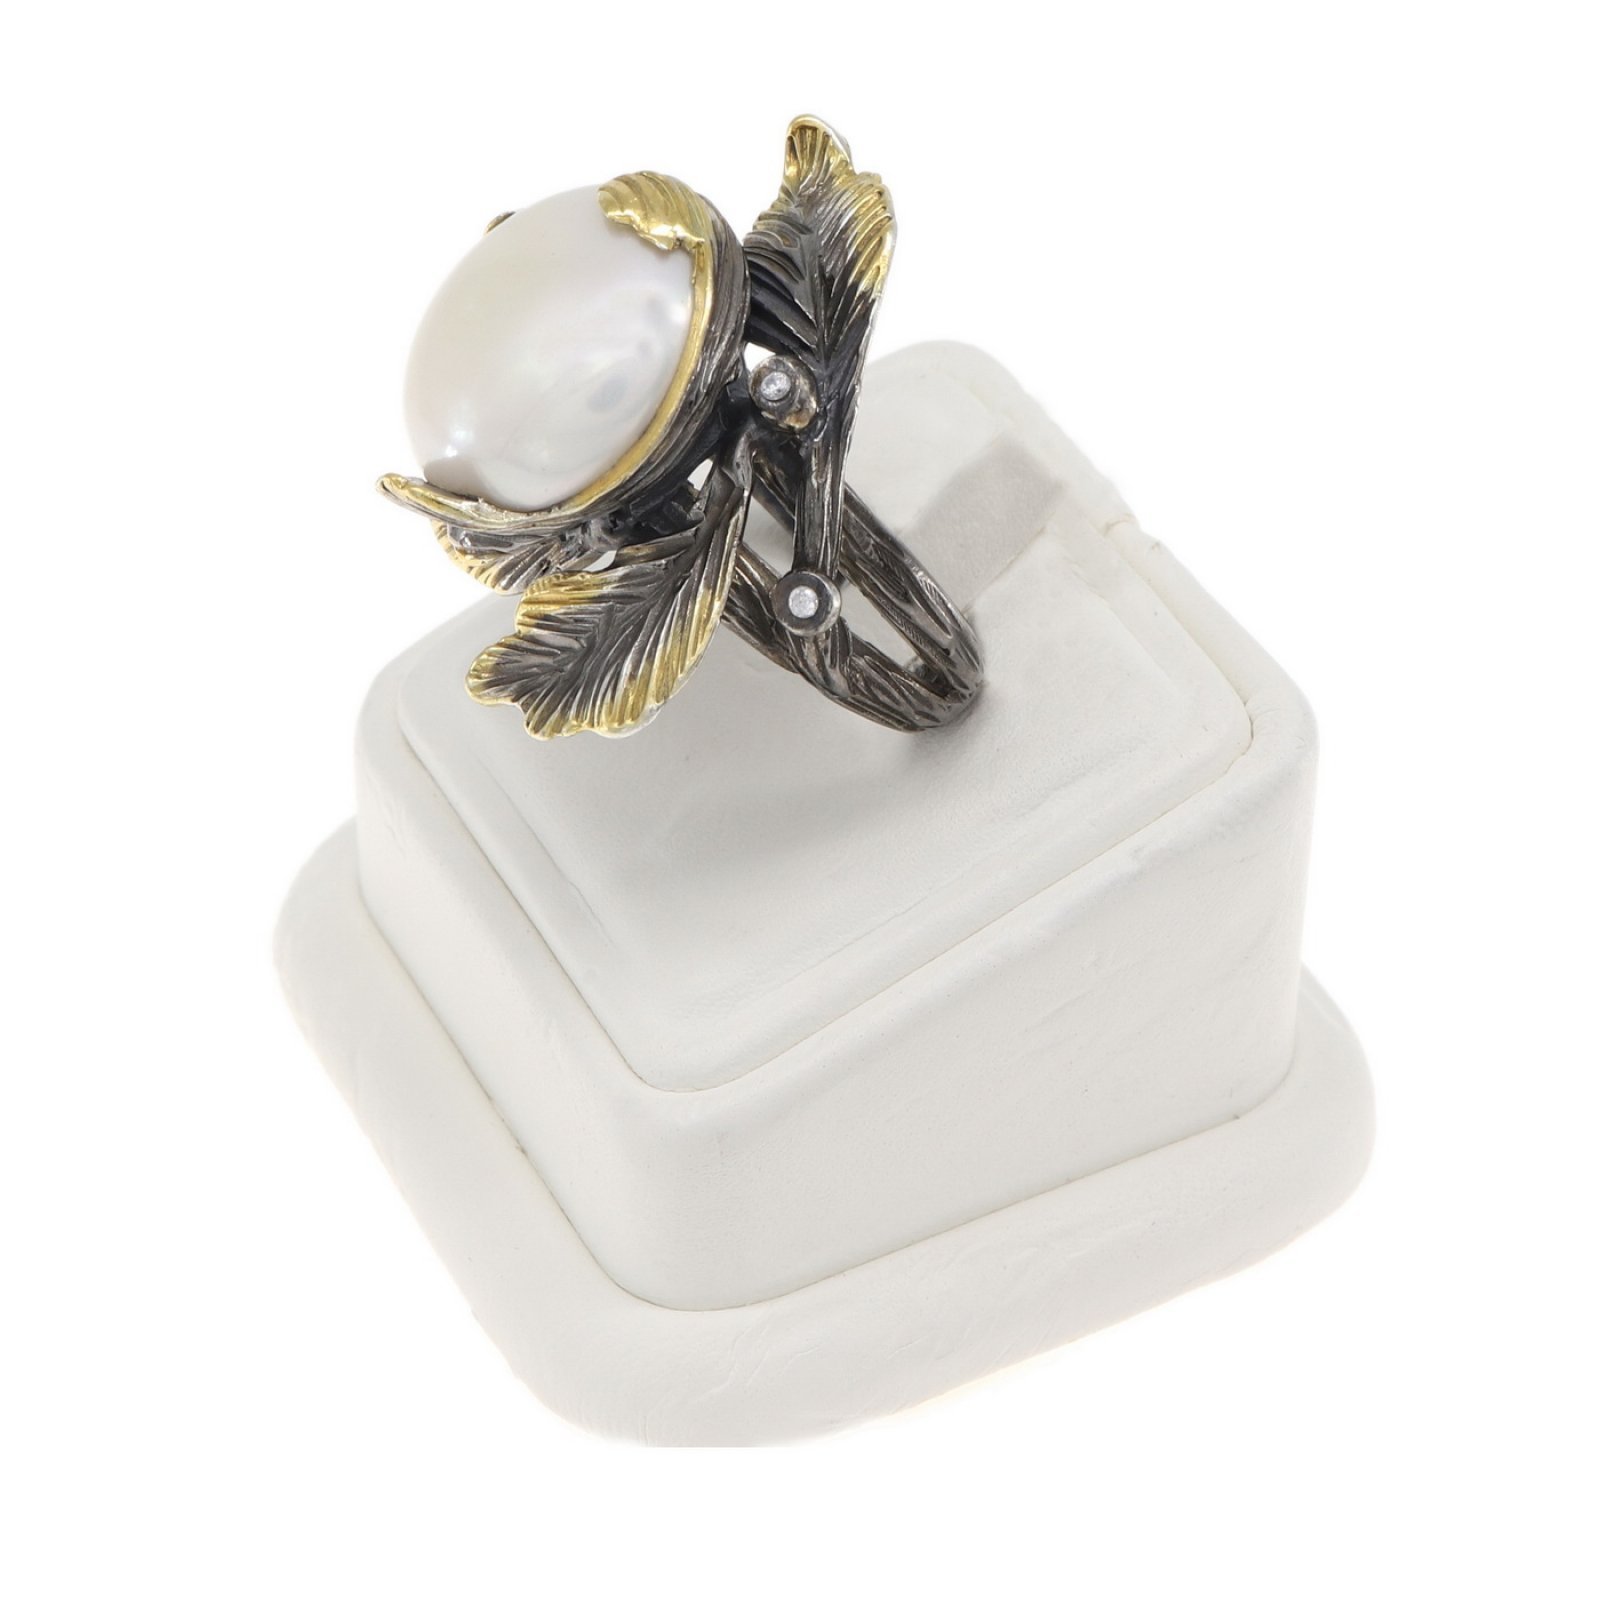 ART1026 - MASTER PIECE RING